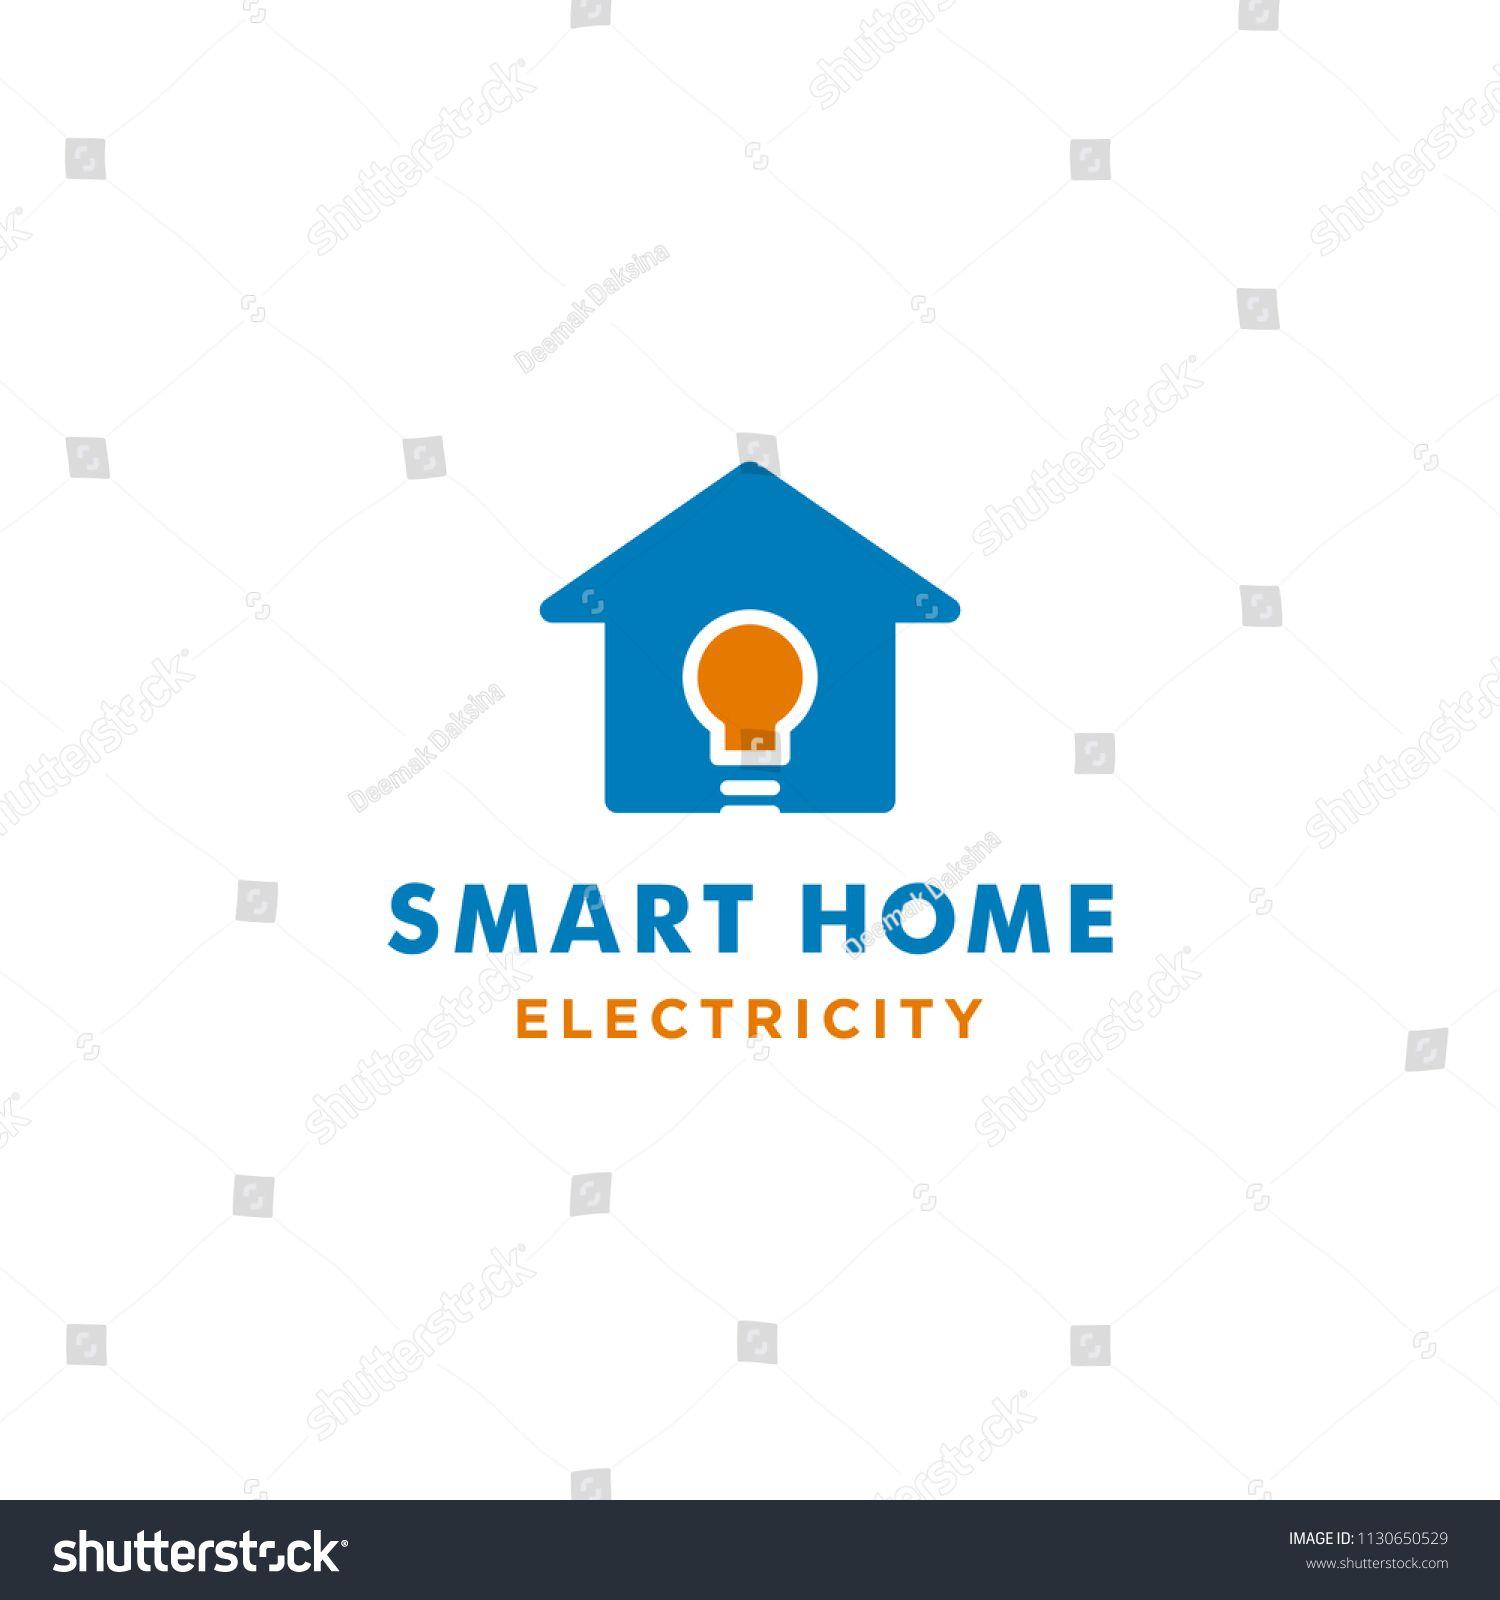 Smart Home Logo Design Light Bulb. smart, home, technology